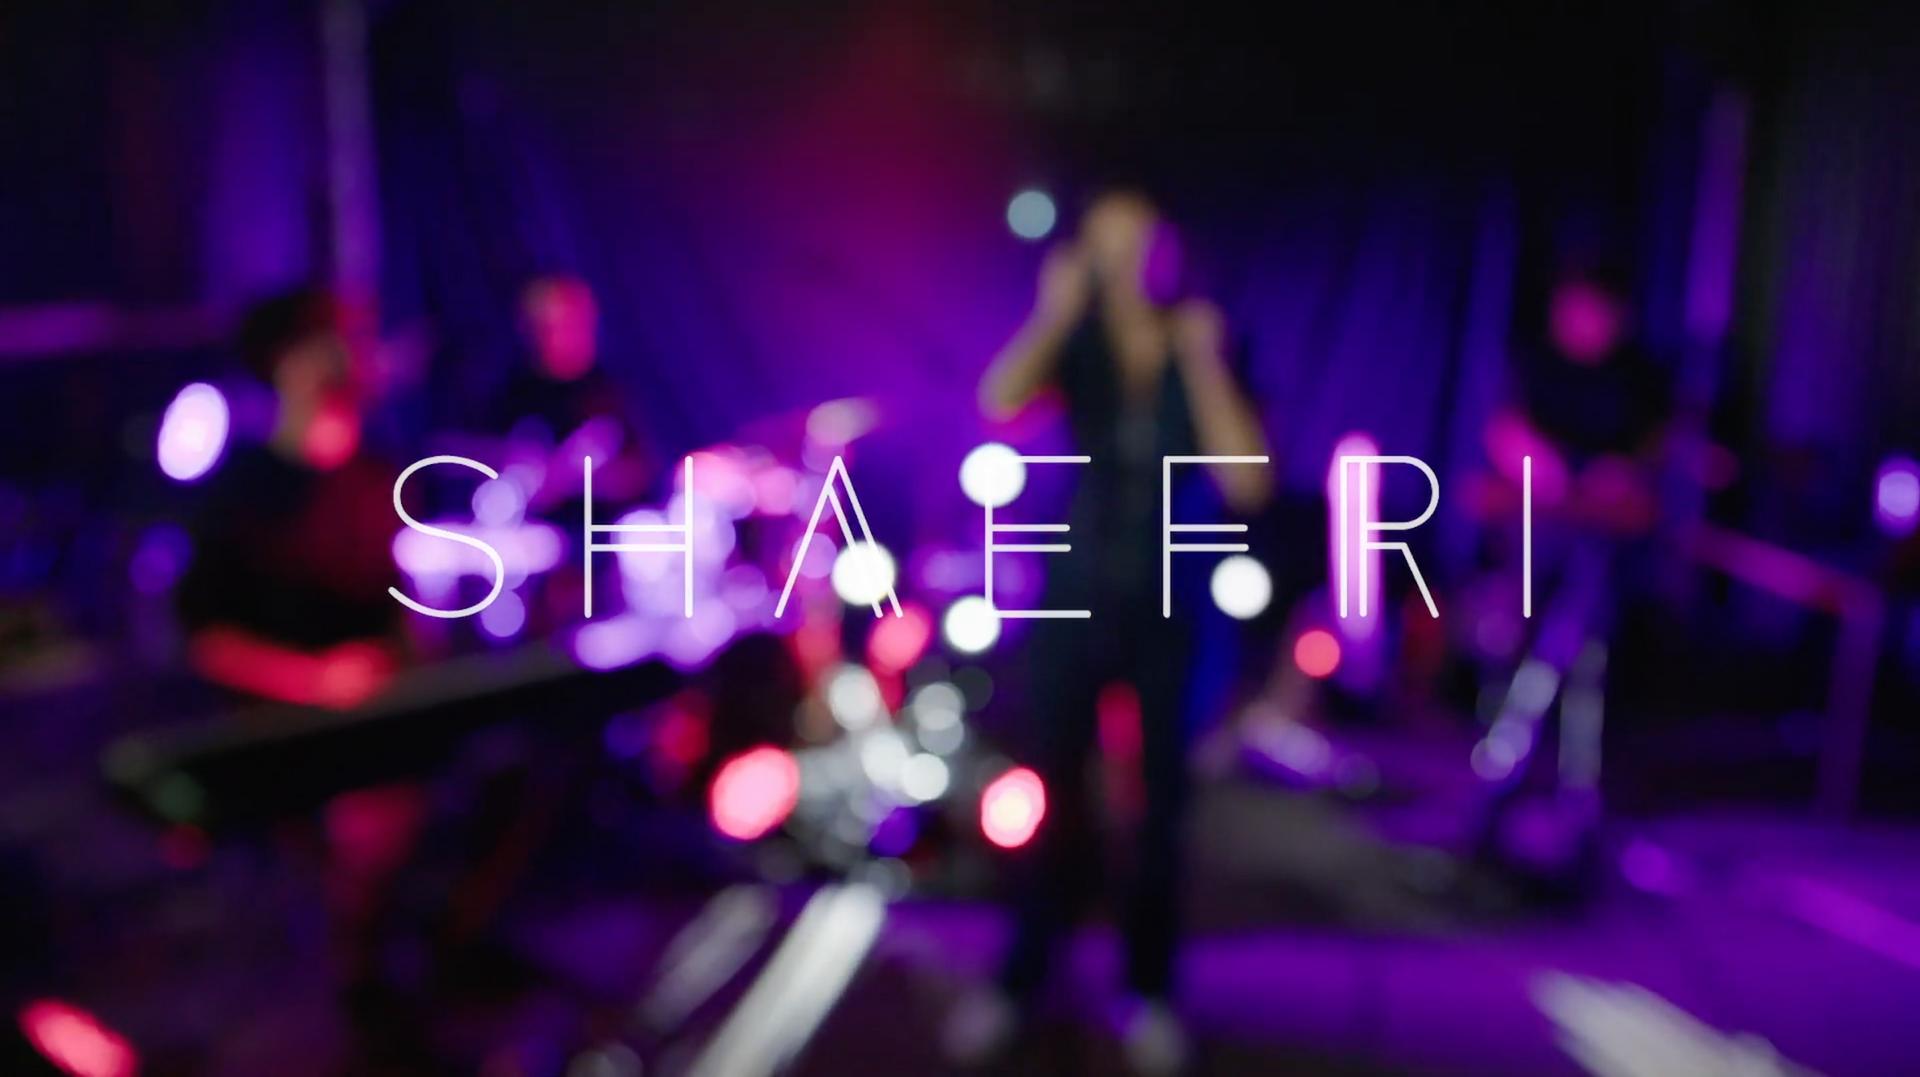 Shaefri_02.png